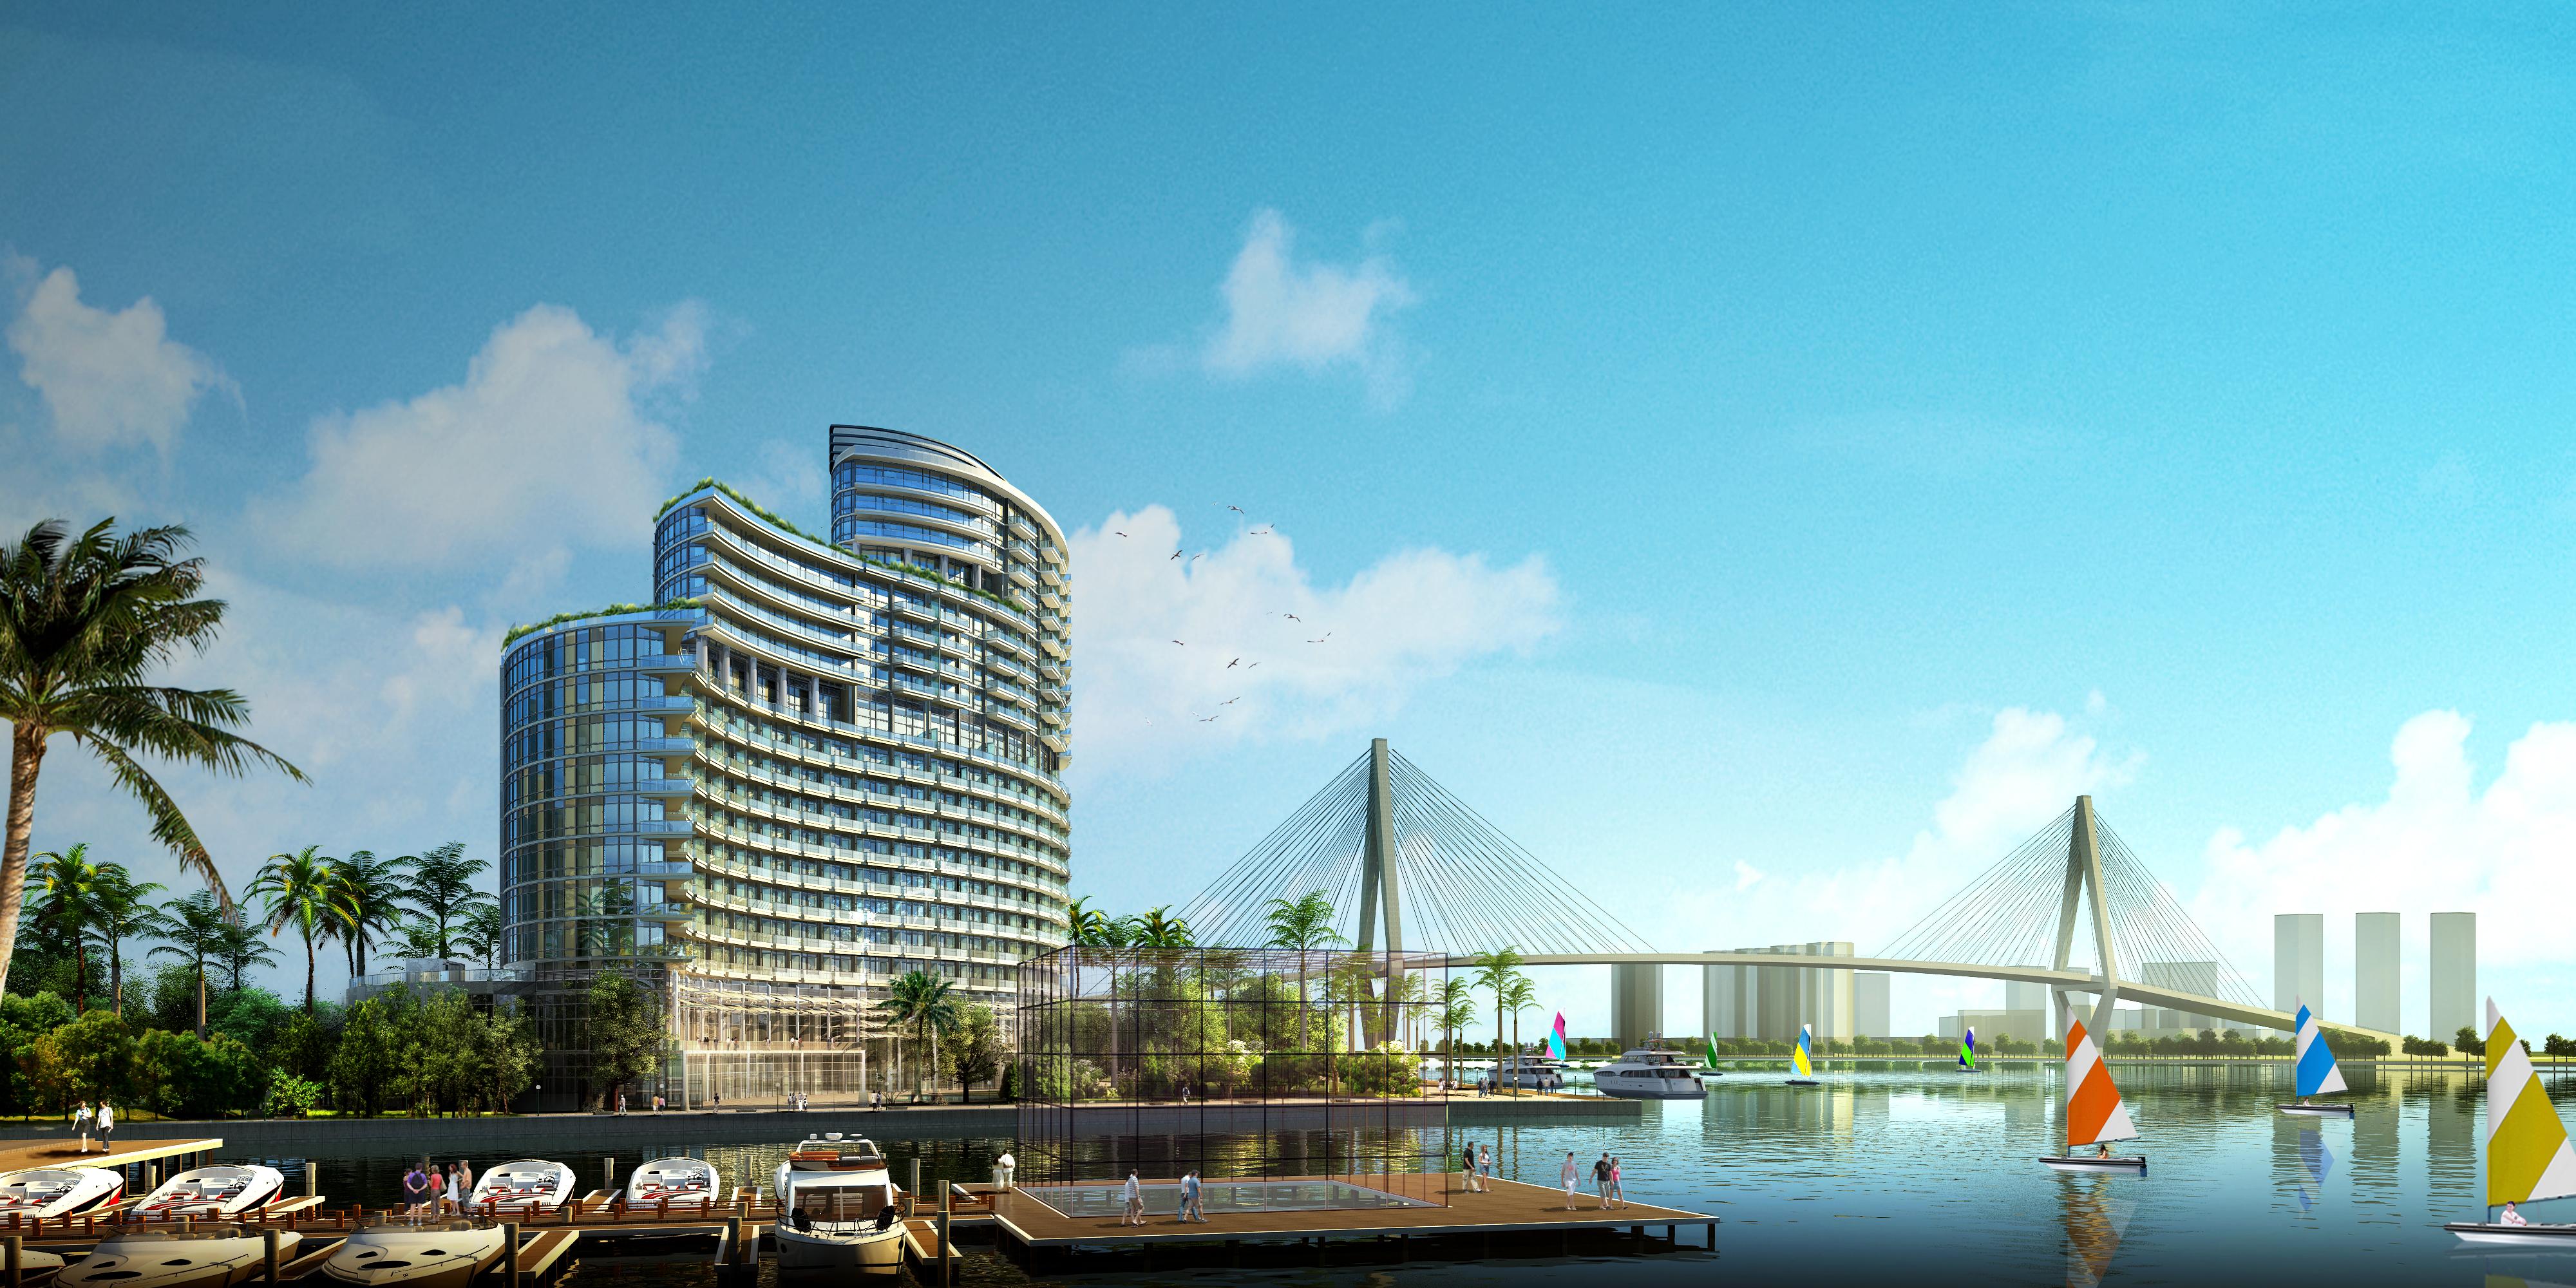 Haikou Danna Marina Hotel And Residences Architect